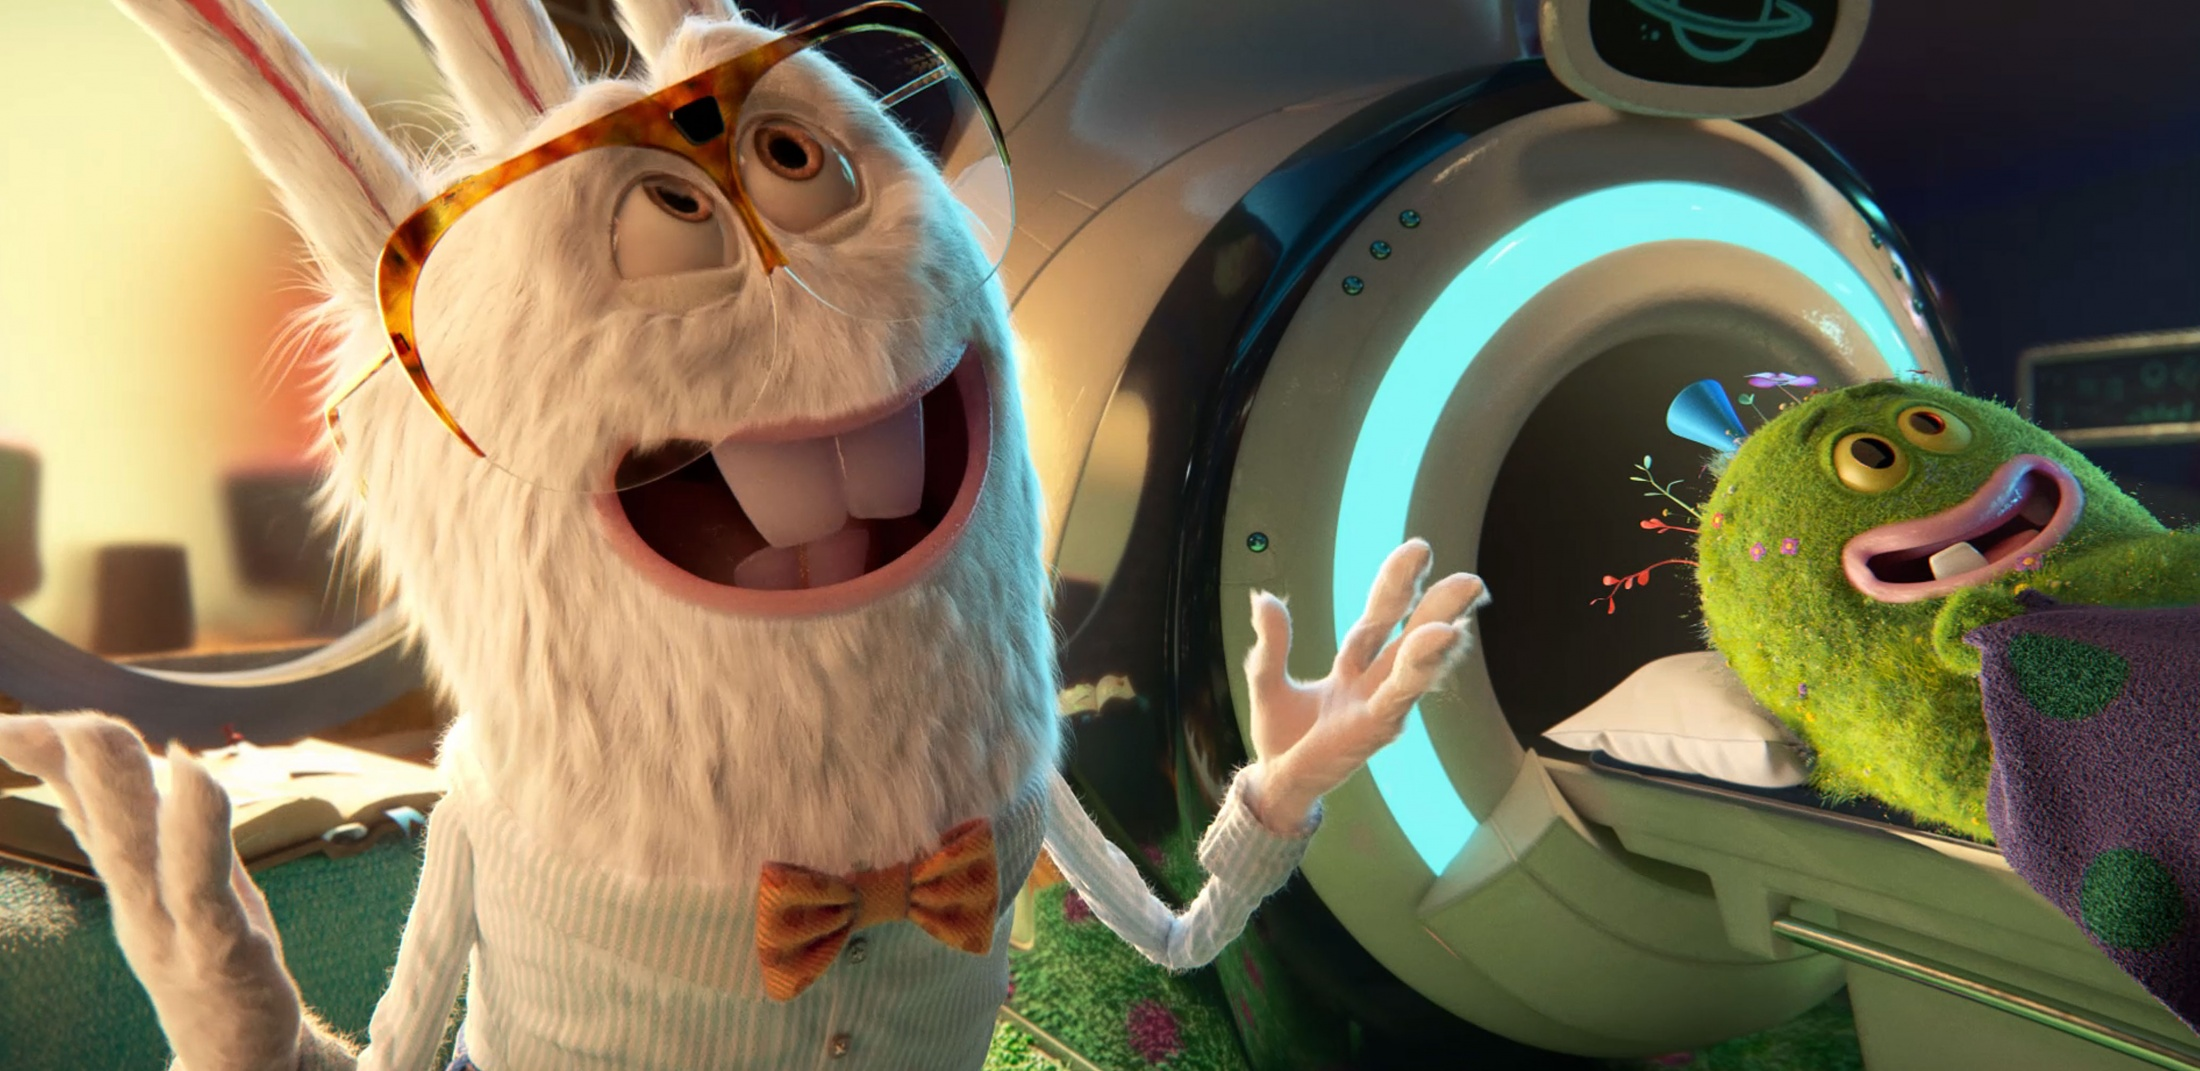 Thumbnail for Imaginary Friend Society - Whats an MRI?